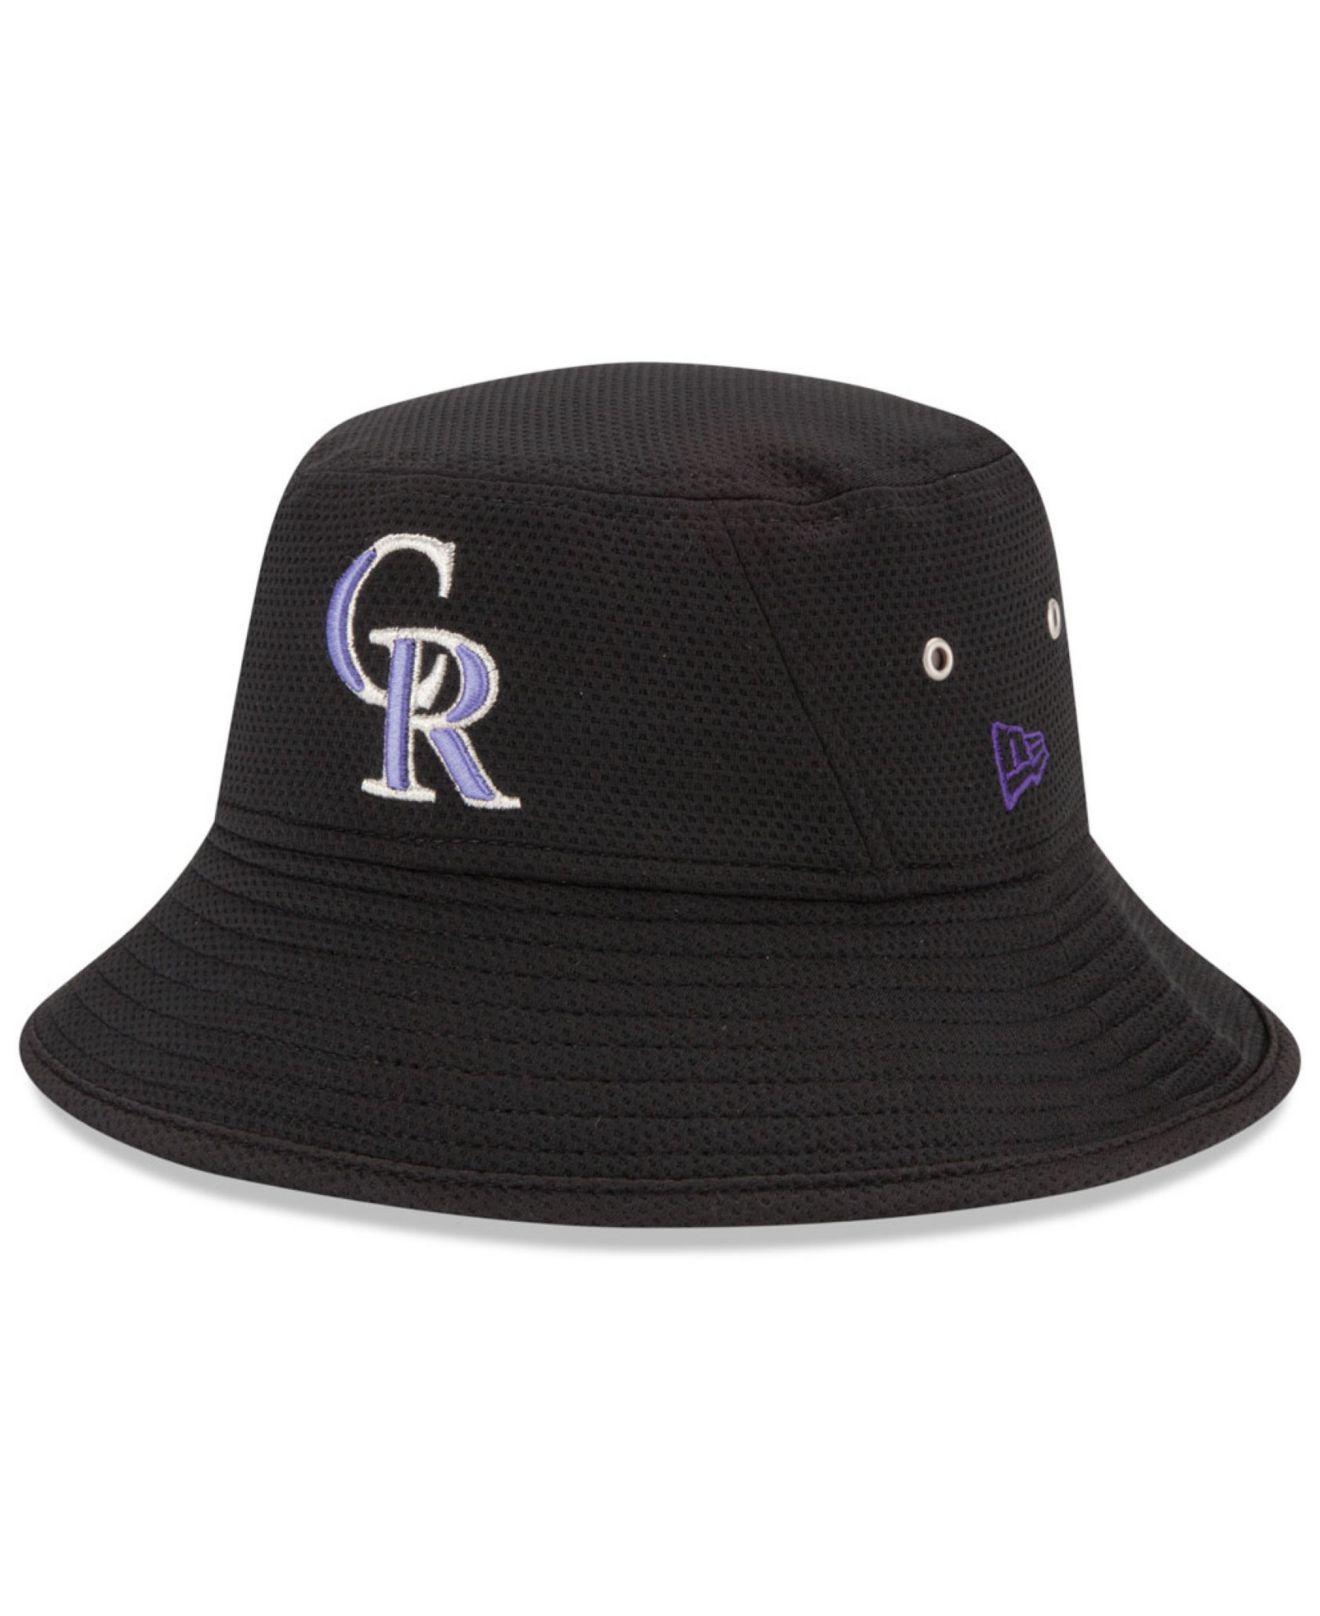 9a302d87 ... usa lyst ktz colorado rockies team redux bucket hat in black for men  2e2ef beb43